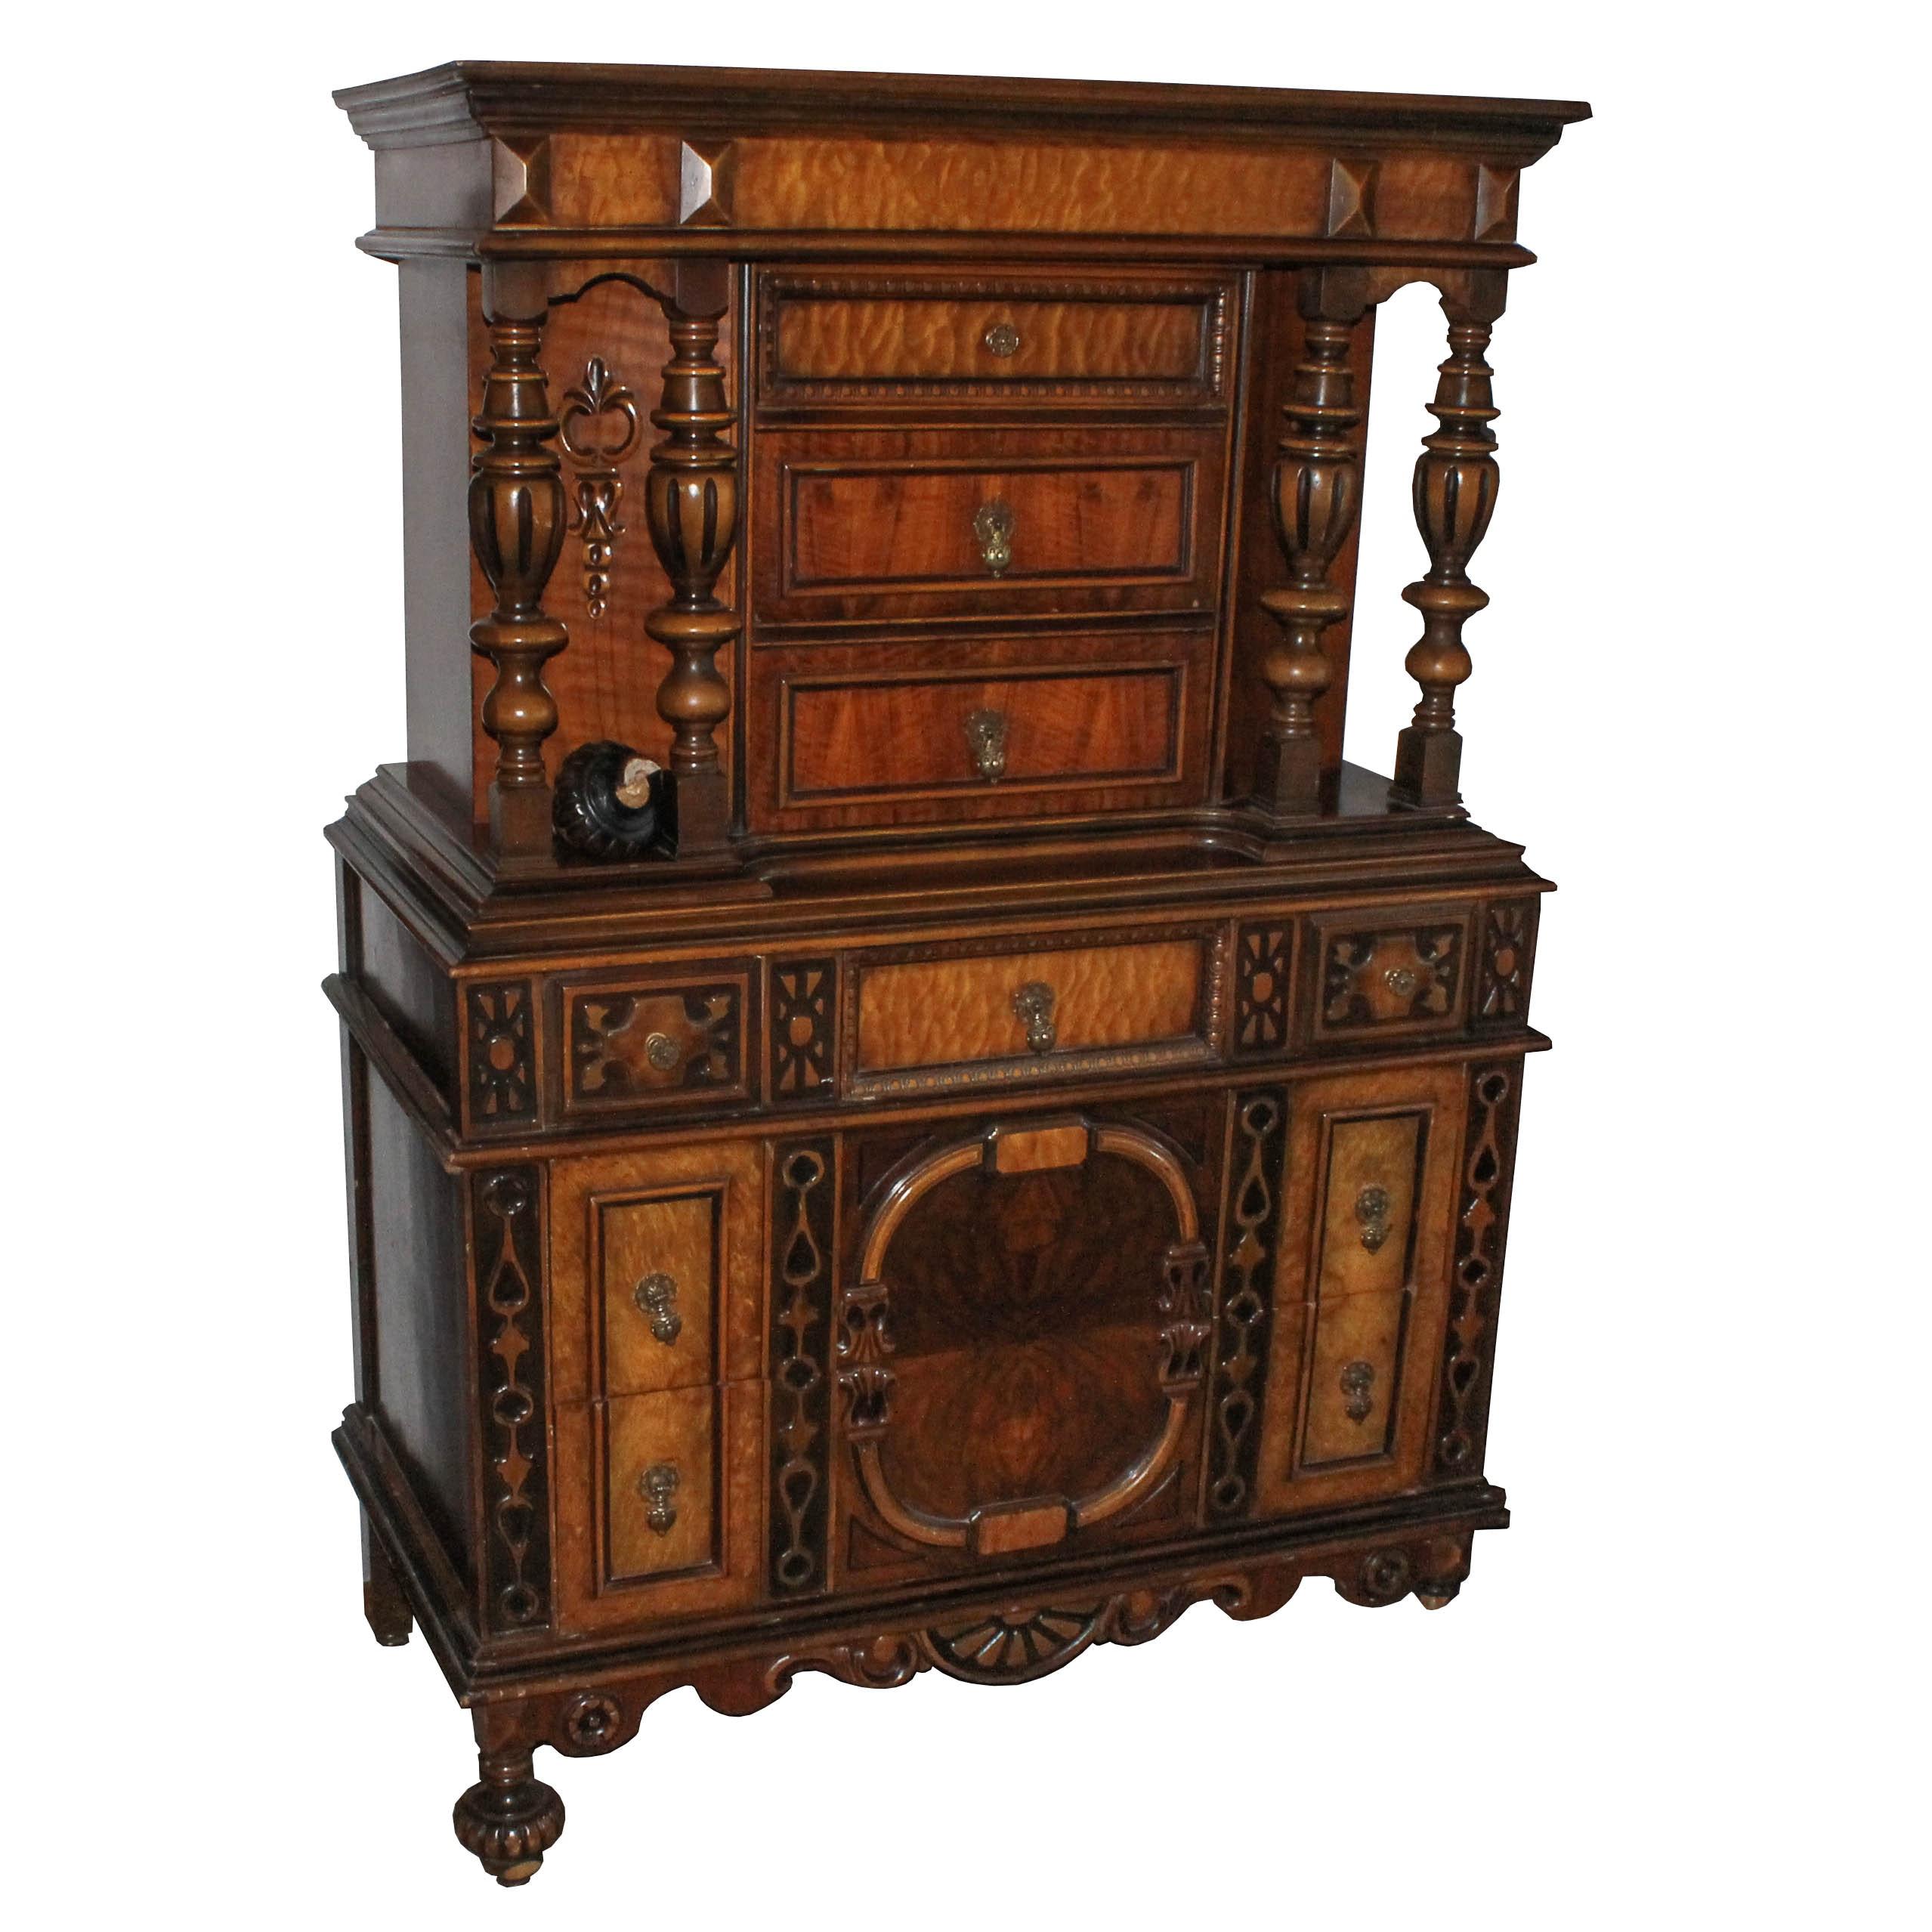 Antique Eastlake Style Gentleman's Dresser